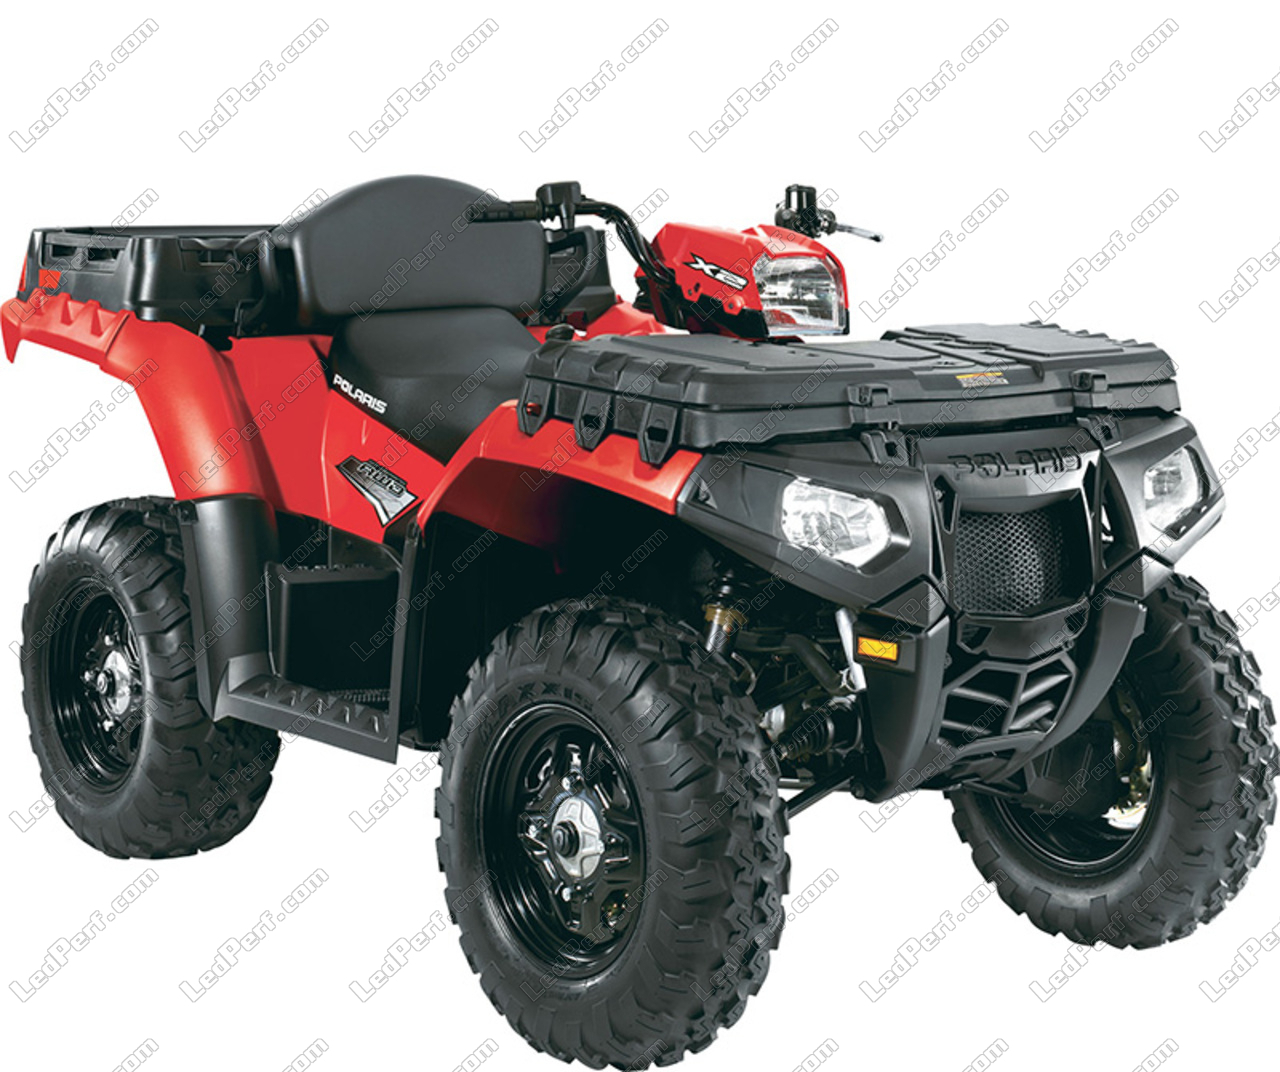 Pack Rear Led Turn Signal For Polaris Sportsman X2 550